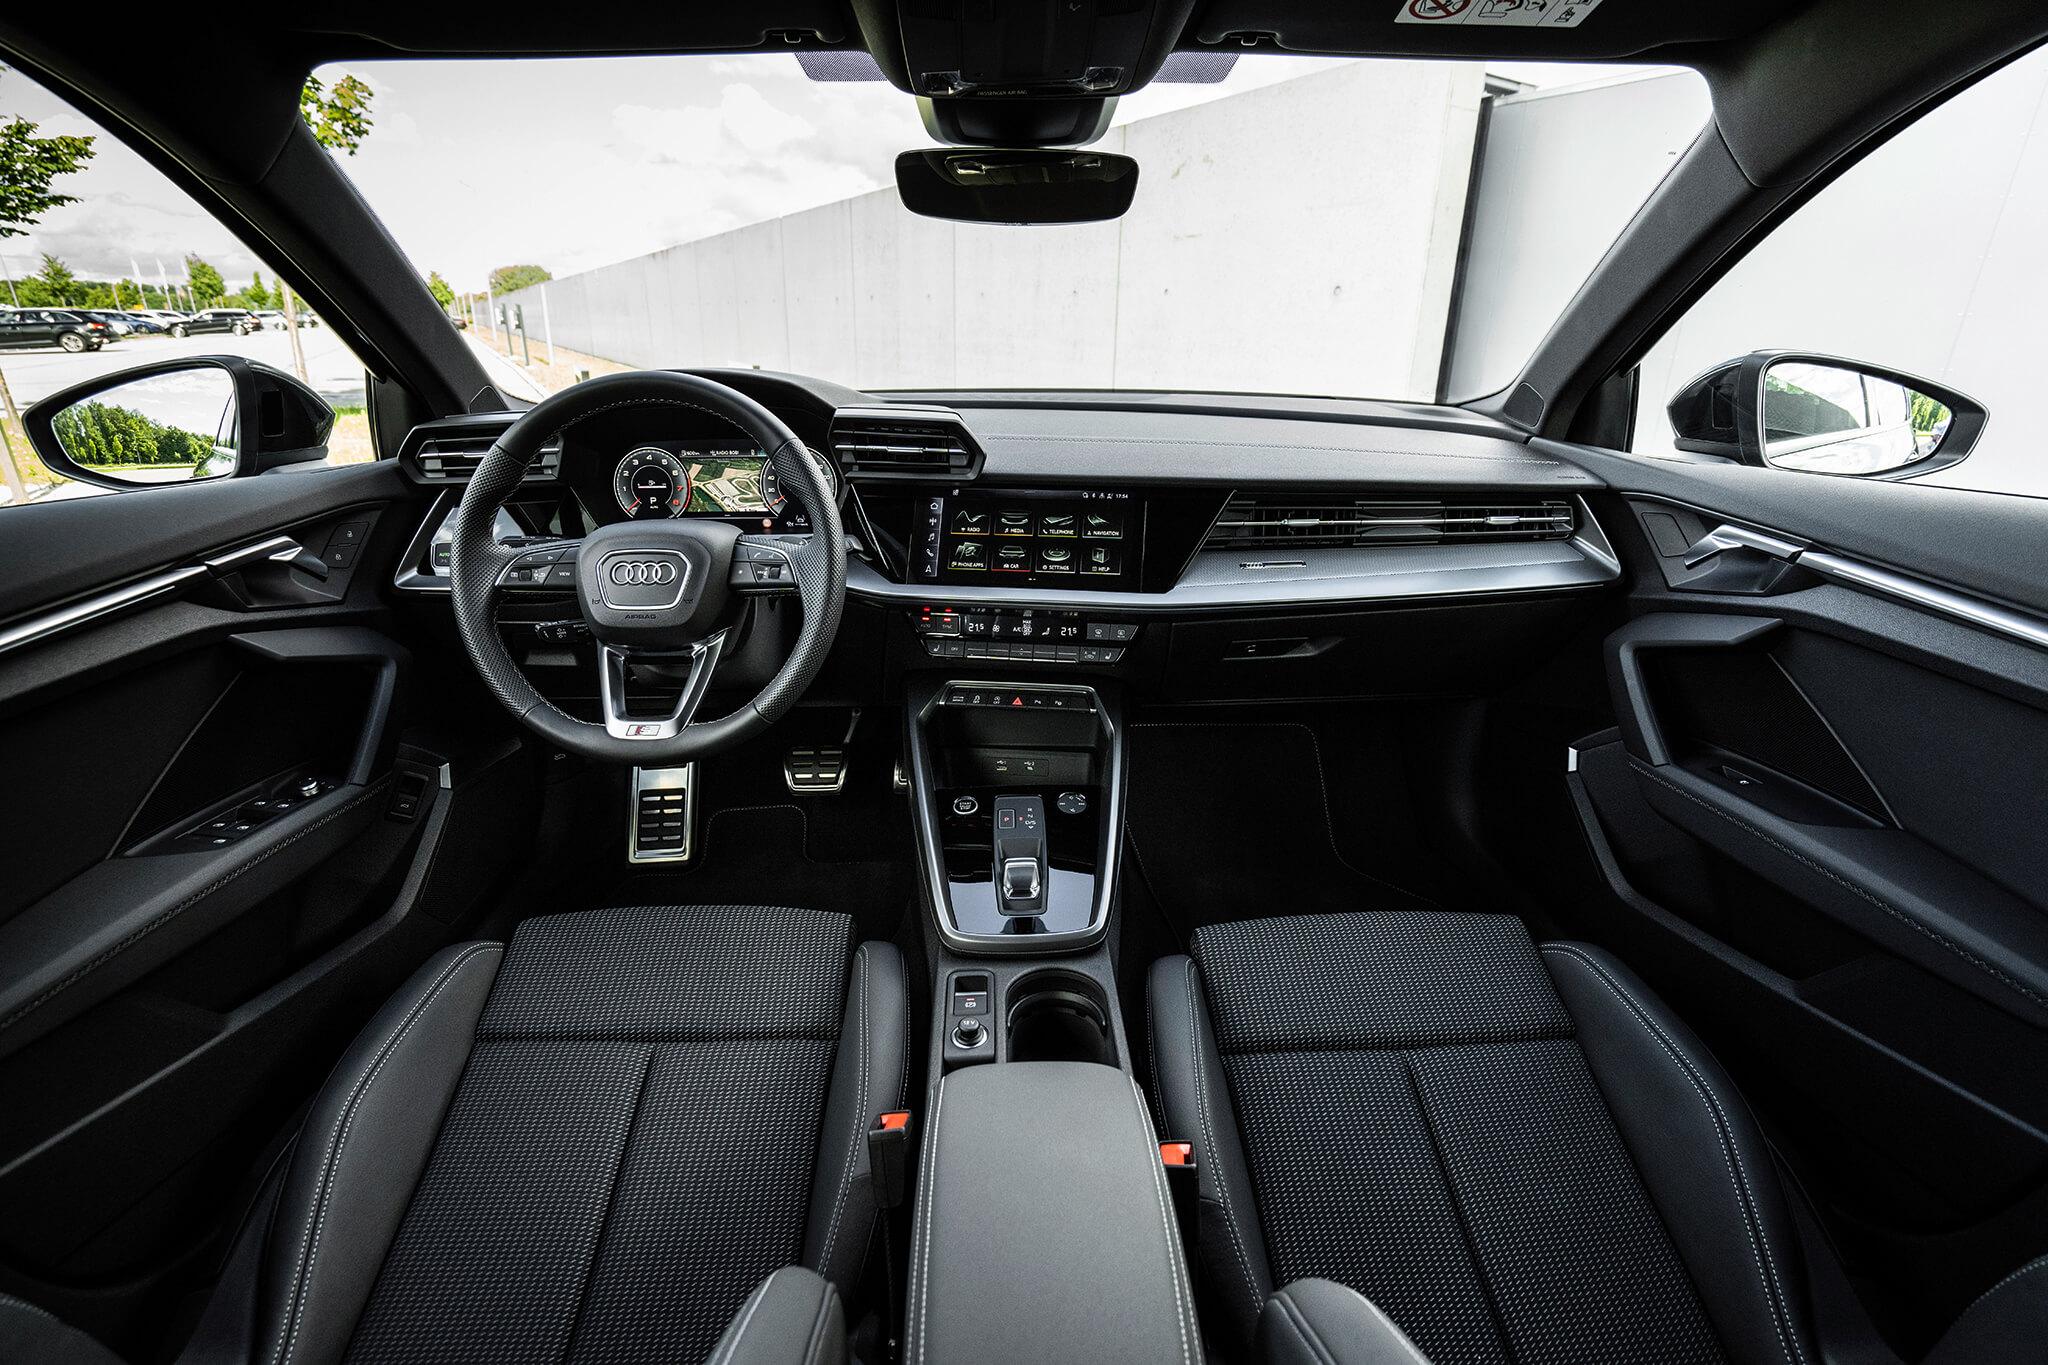 Tabliê Audi A3 Limousine